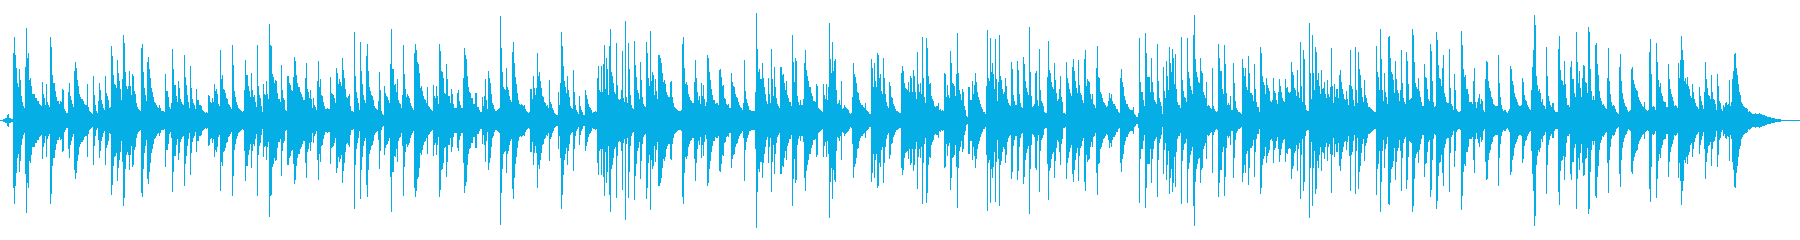 YouTubeセクシー大人のピアノジャズの再生済みの波形